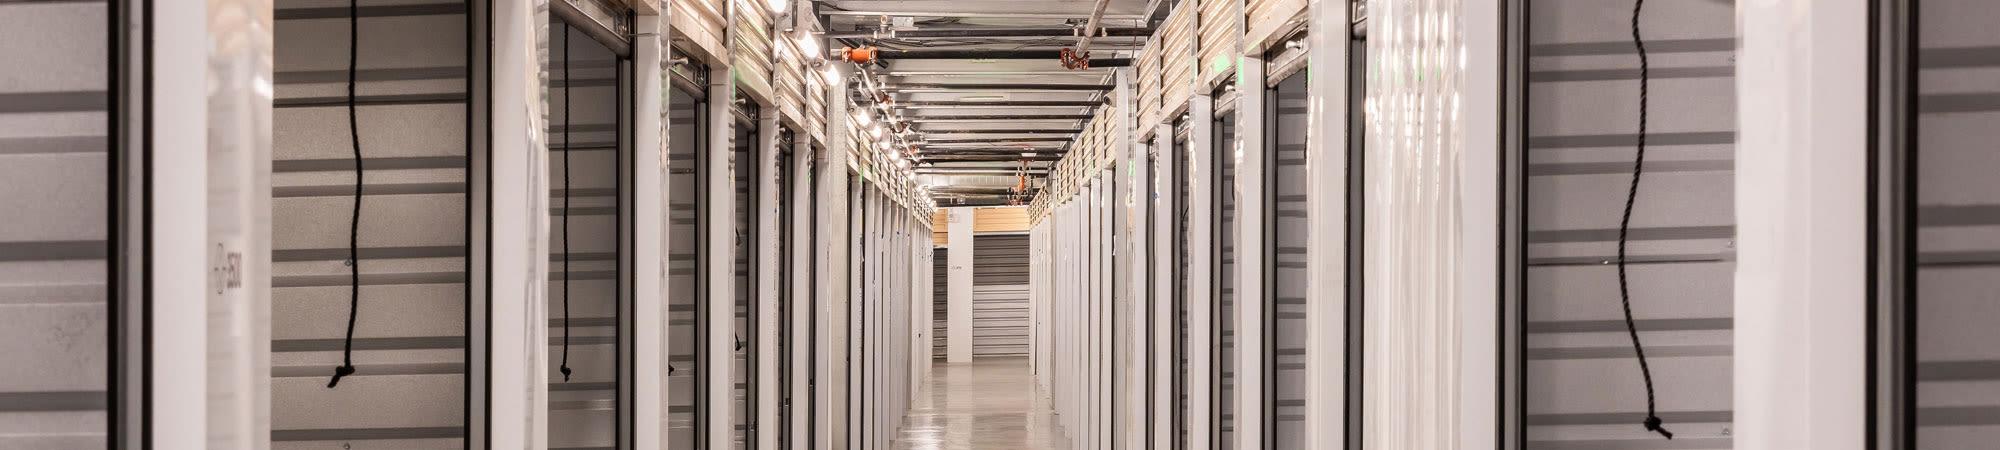 Climate-controlled storage at Cubes Self Storage in Farmington, Utah